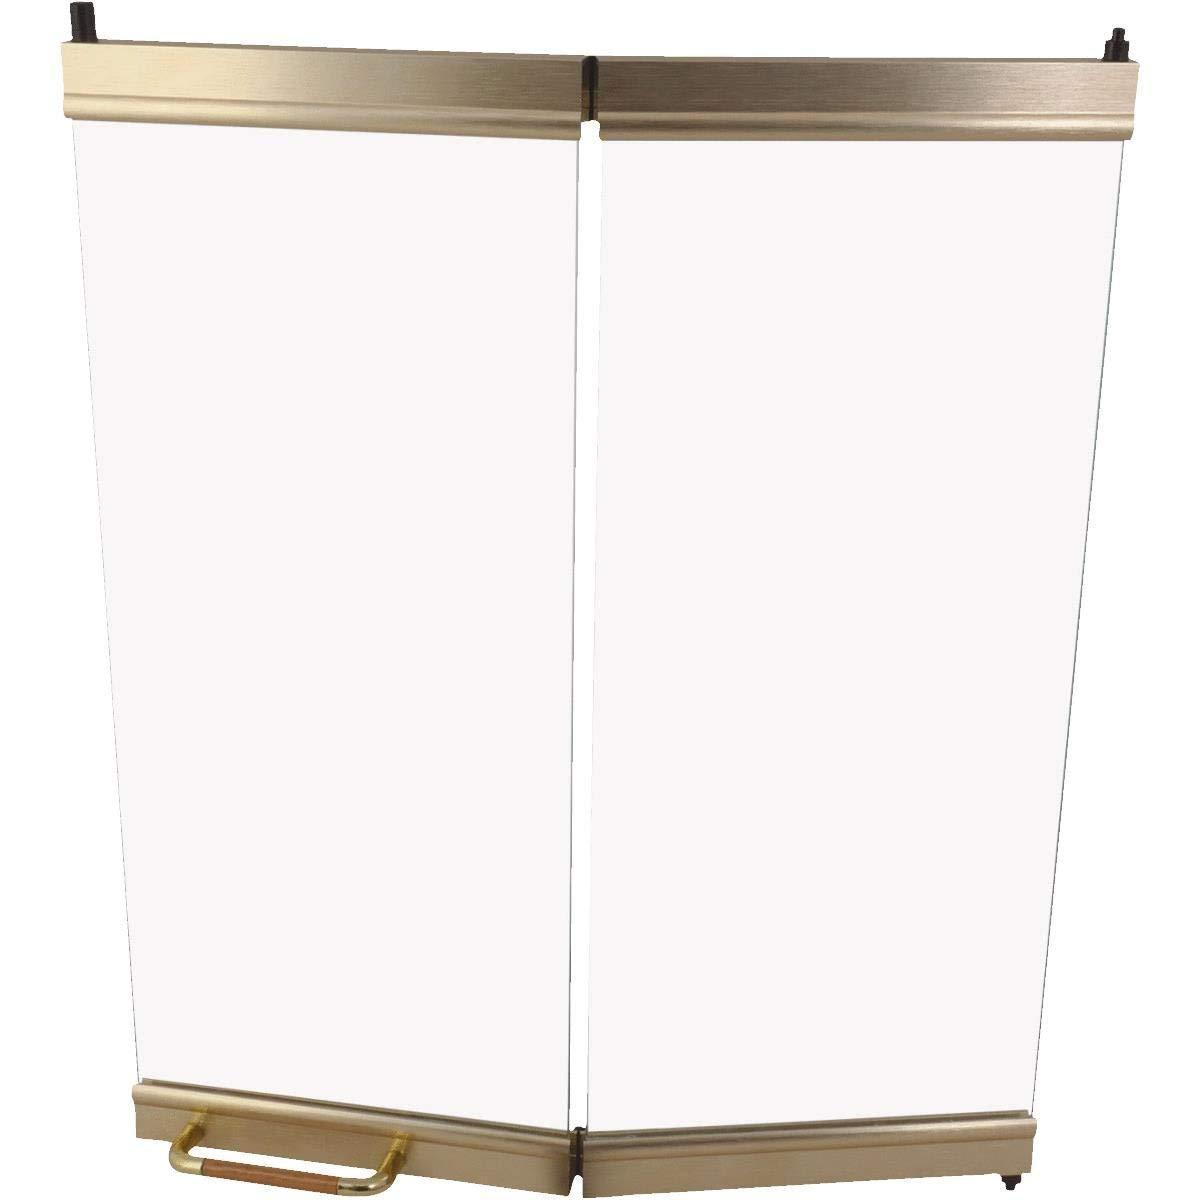 Comfort Flame BDB36B Wood Burning Aluminum Bi-Fold Door, 36-Inch, Brushed Brass by Comfort Flame